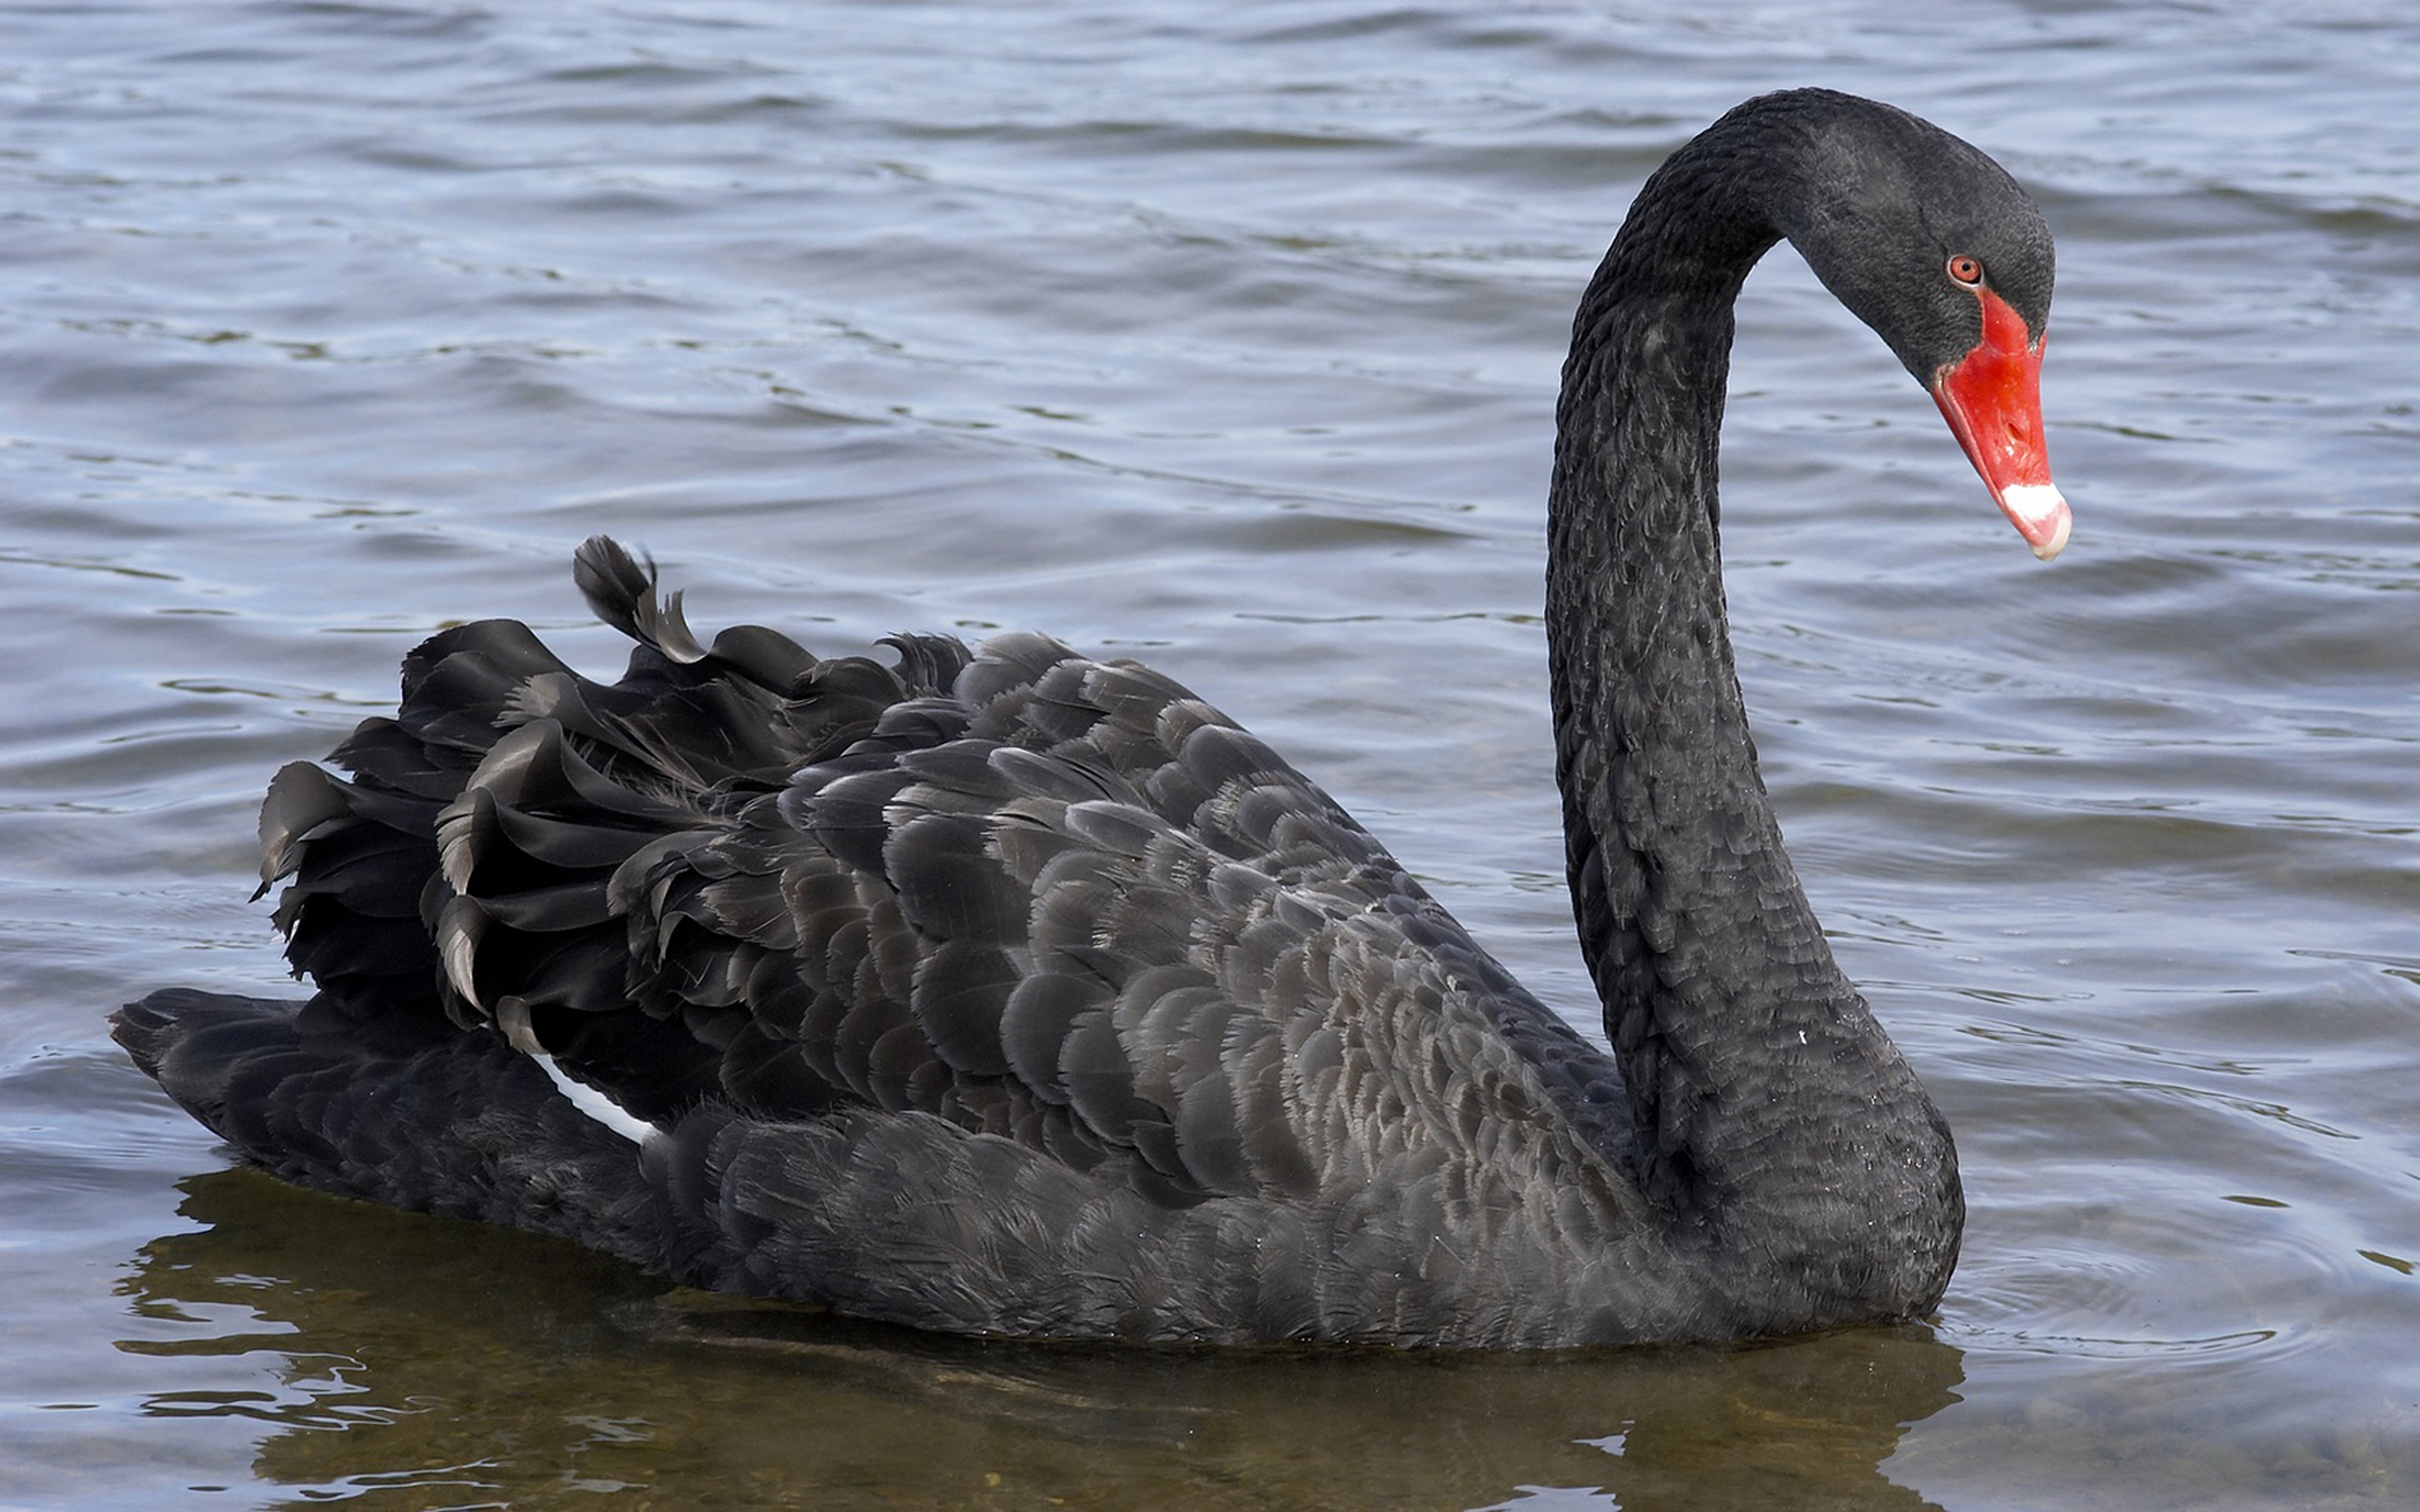 Big Black Swan Wallpaper Hd For Mobile Phone 3840x2400 3840x2400